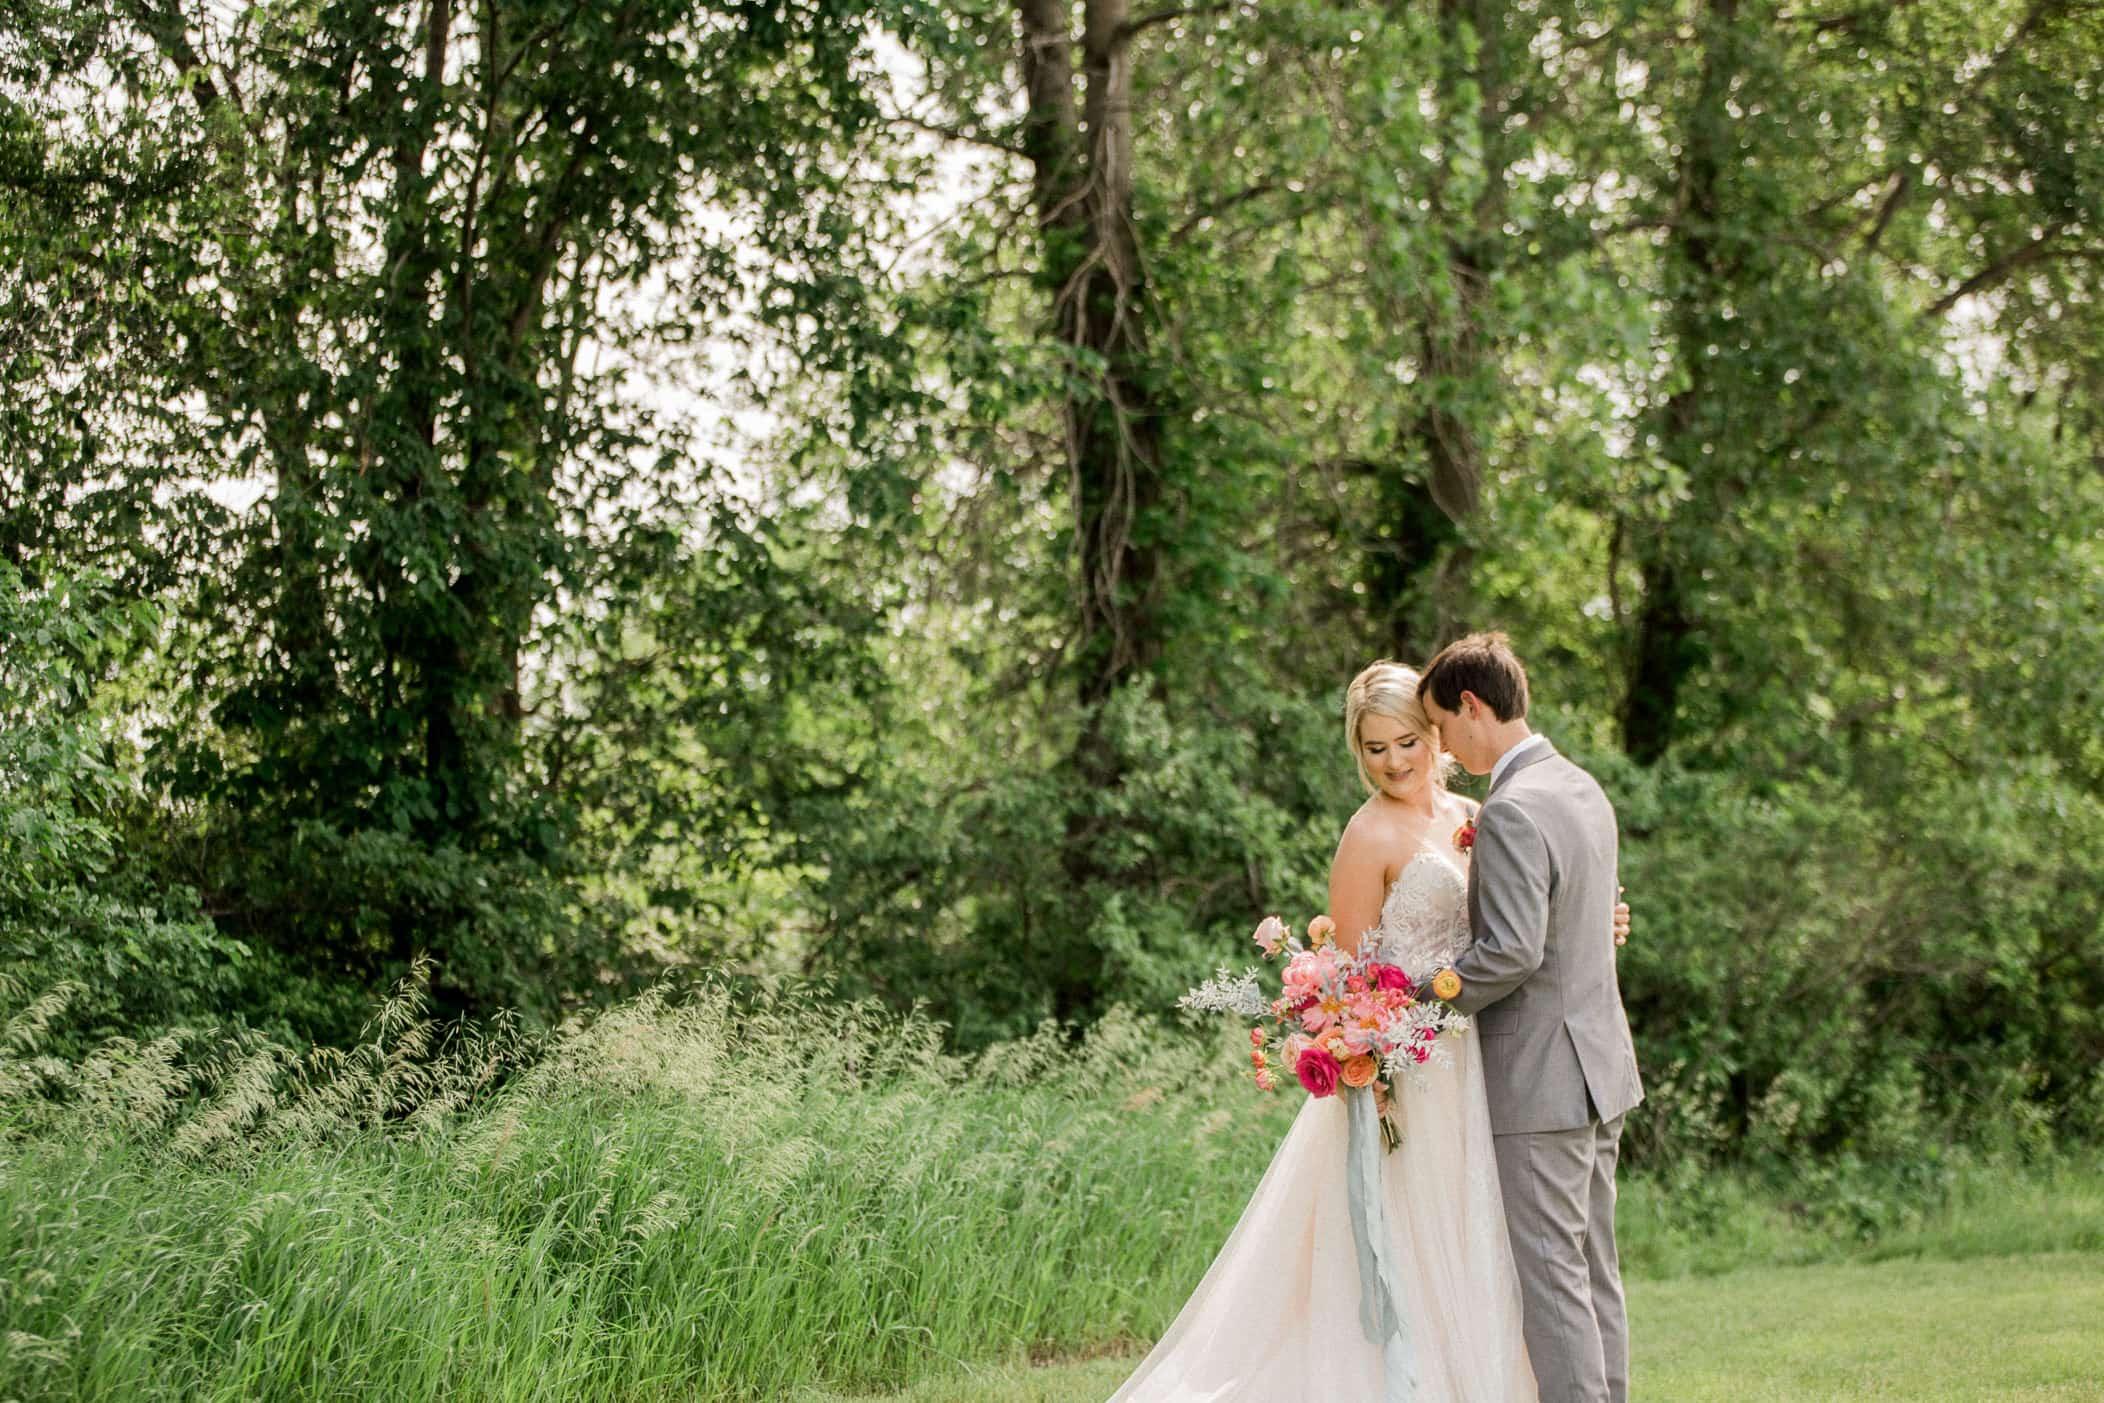 Irishman Acres Clover Barn wedding